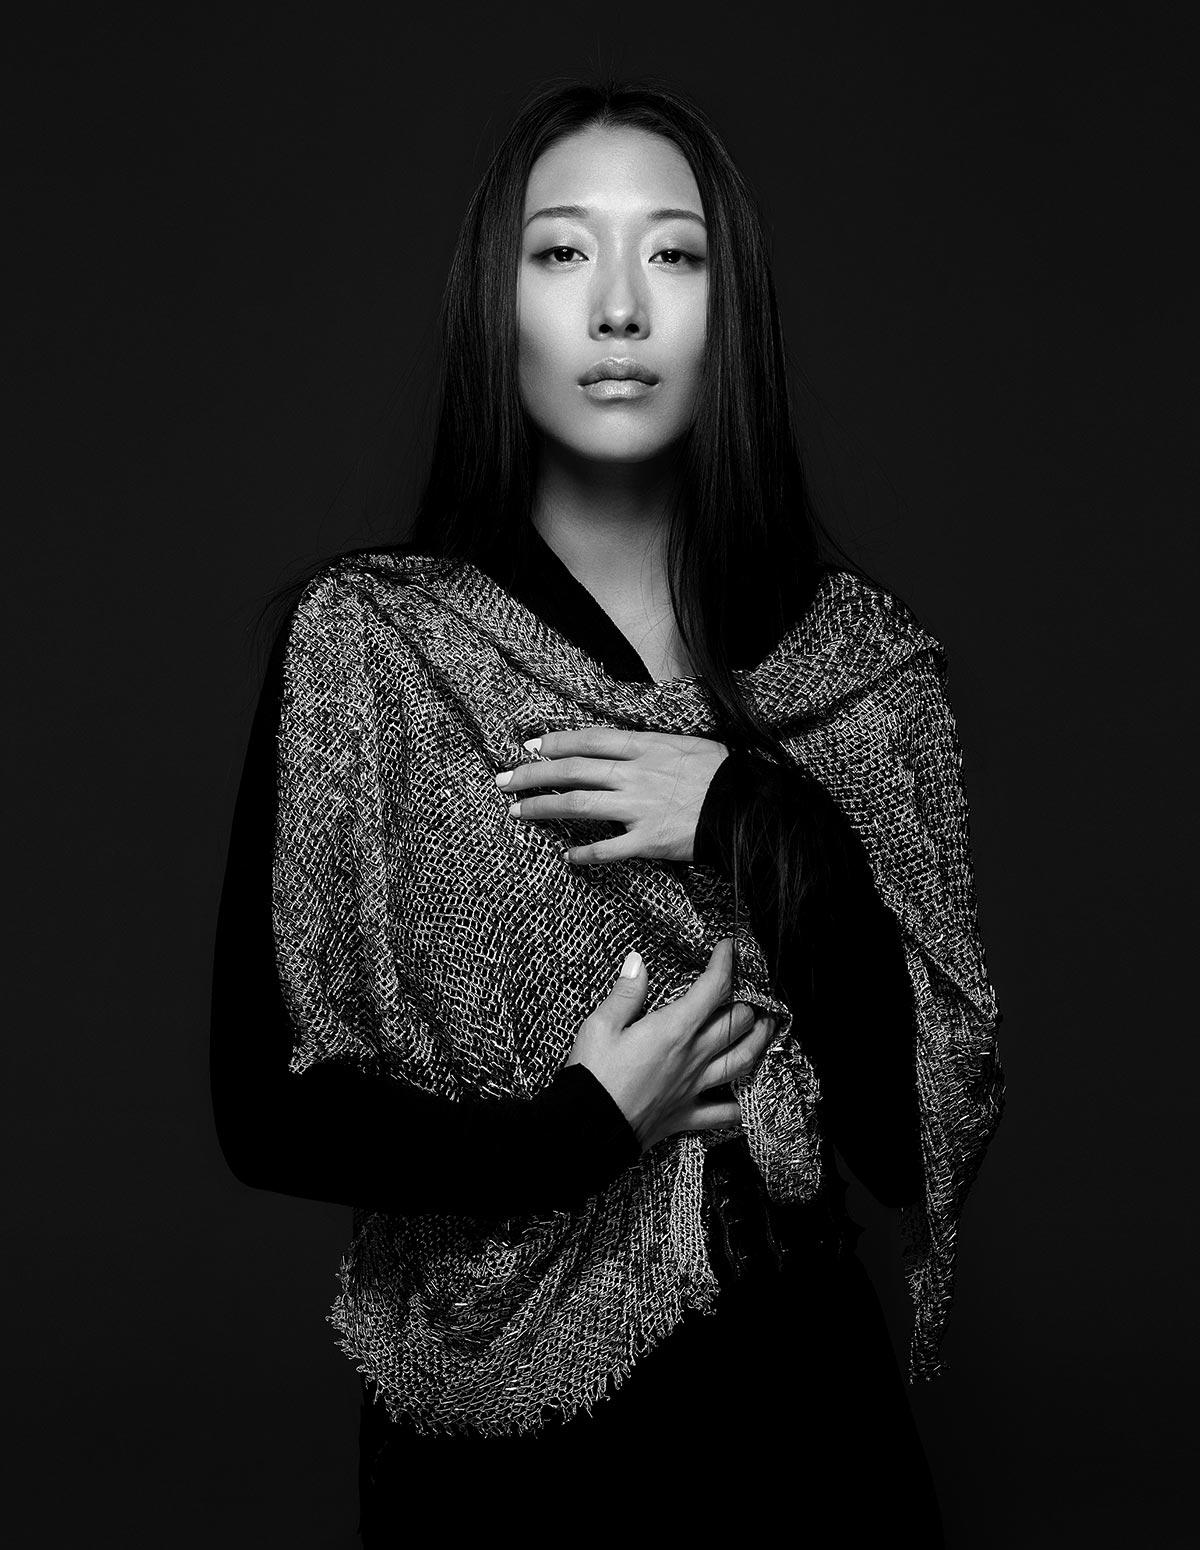 INTERVIEW– Portriat du créateur de mode, Yiqing Yin.